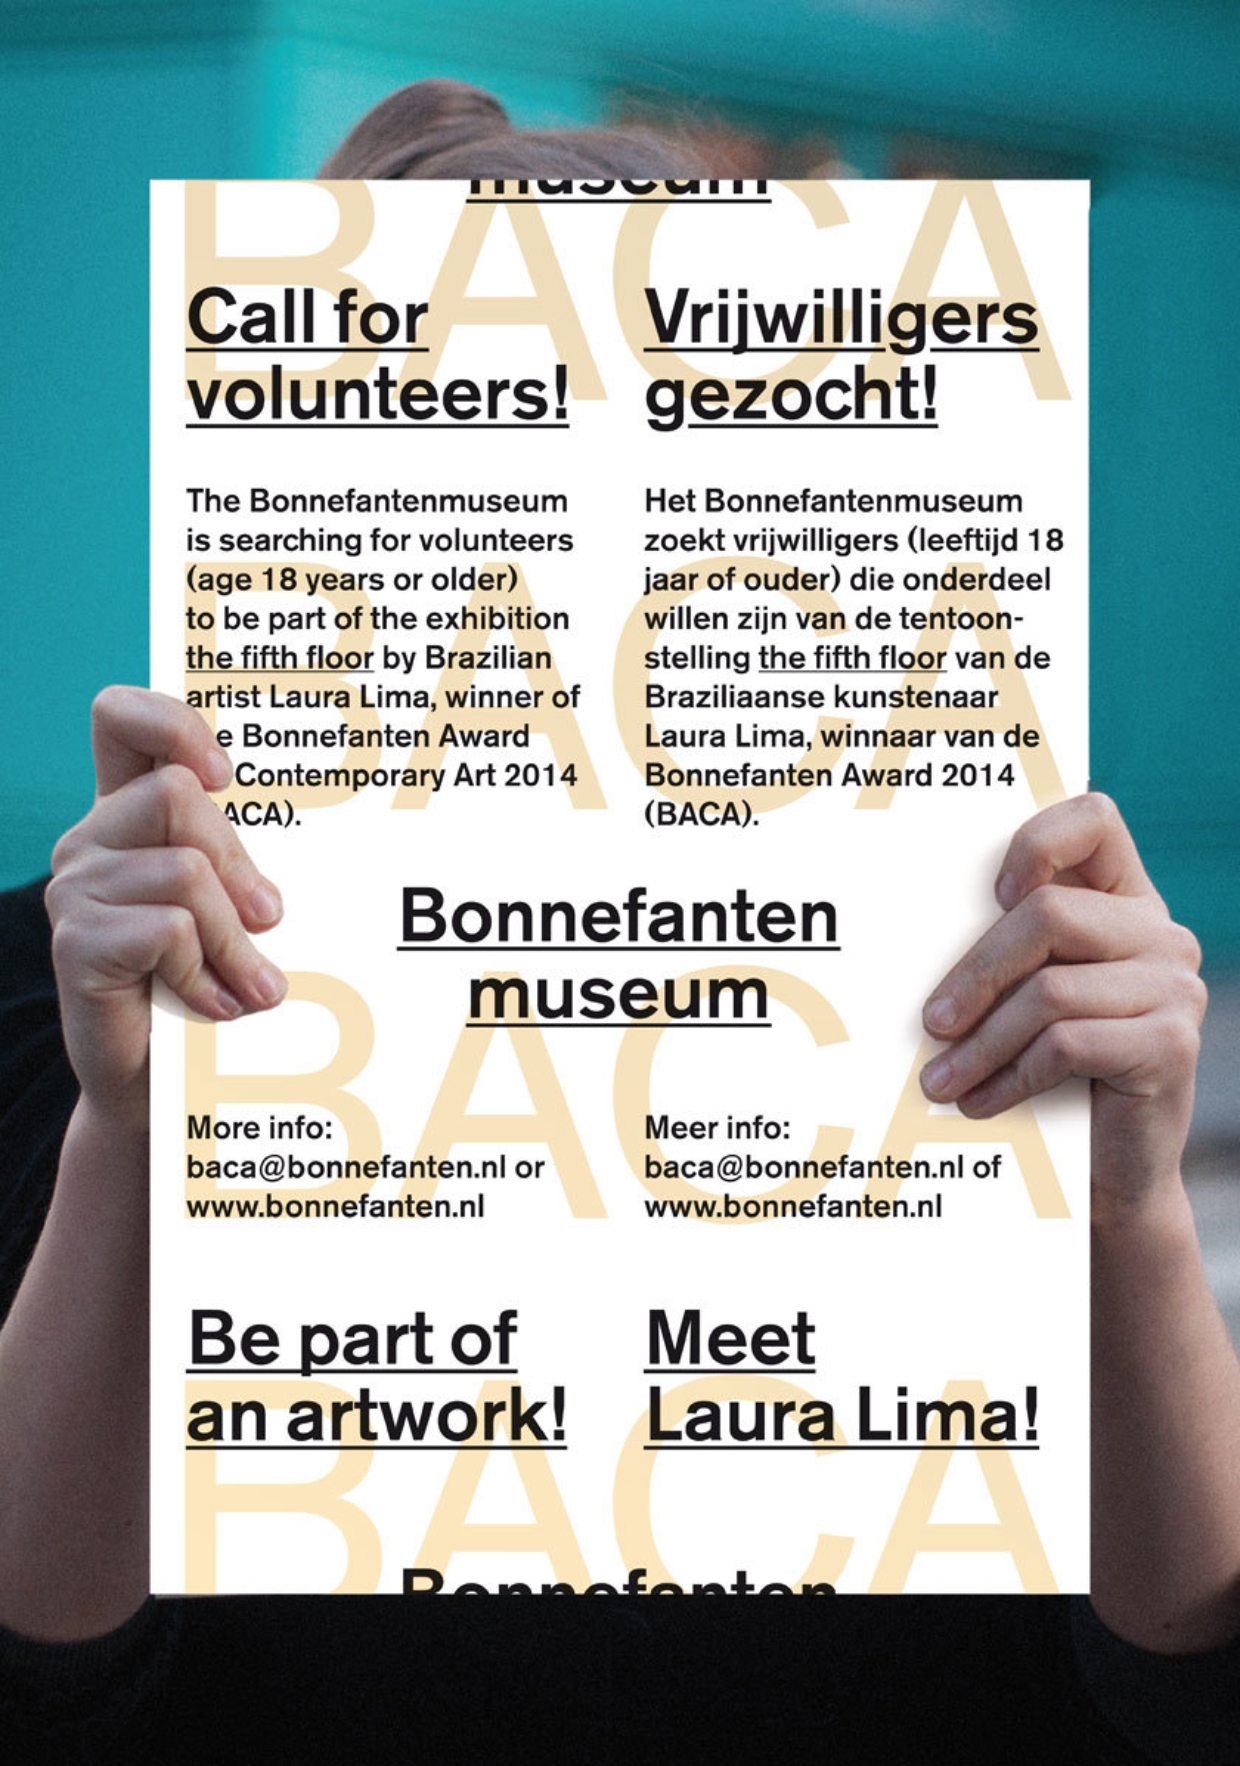 Affiche Vrijwilligers gezocht